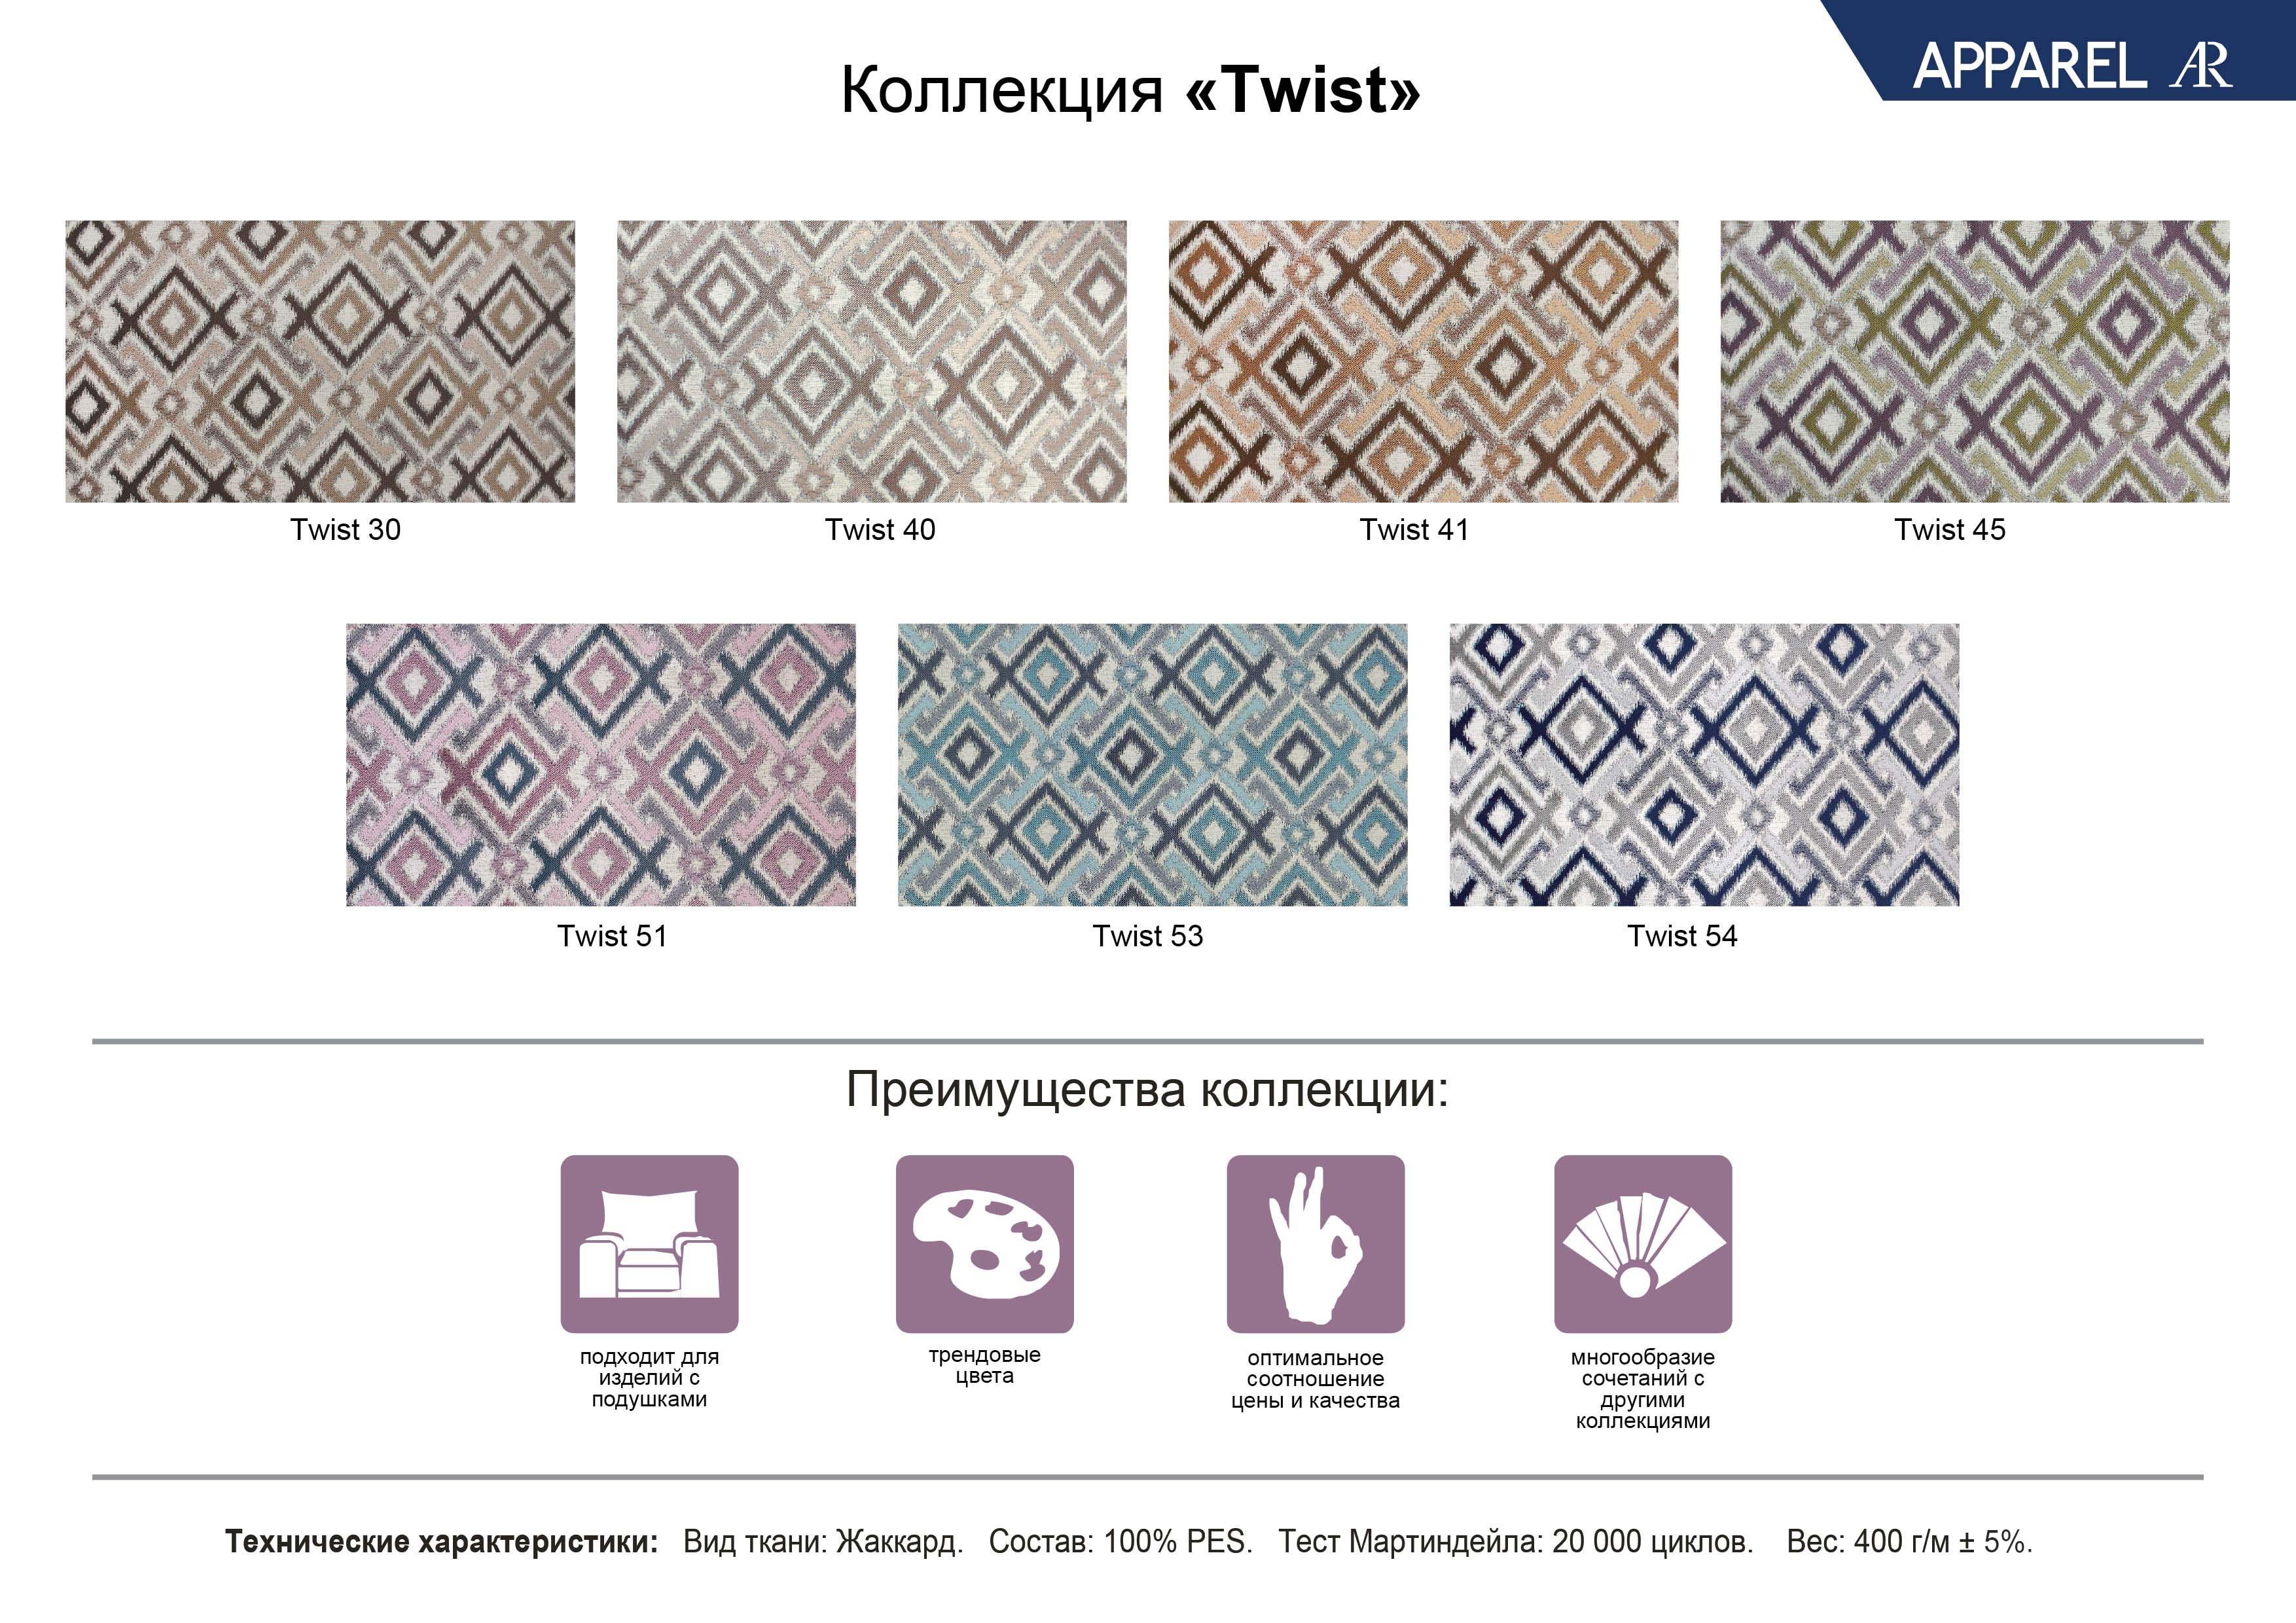 Картинки по запросу twist apparel